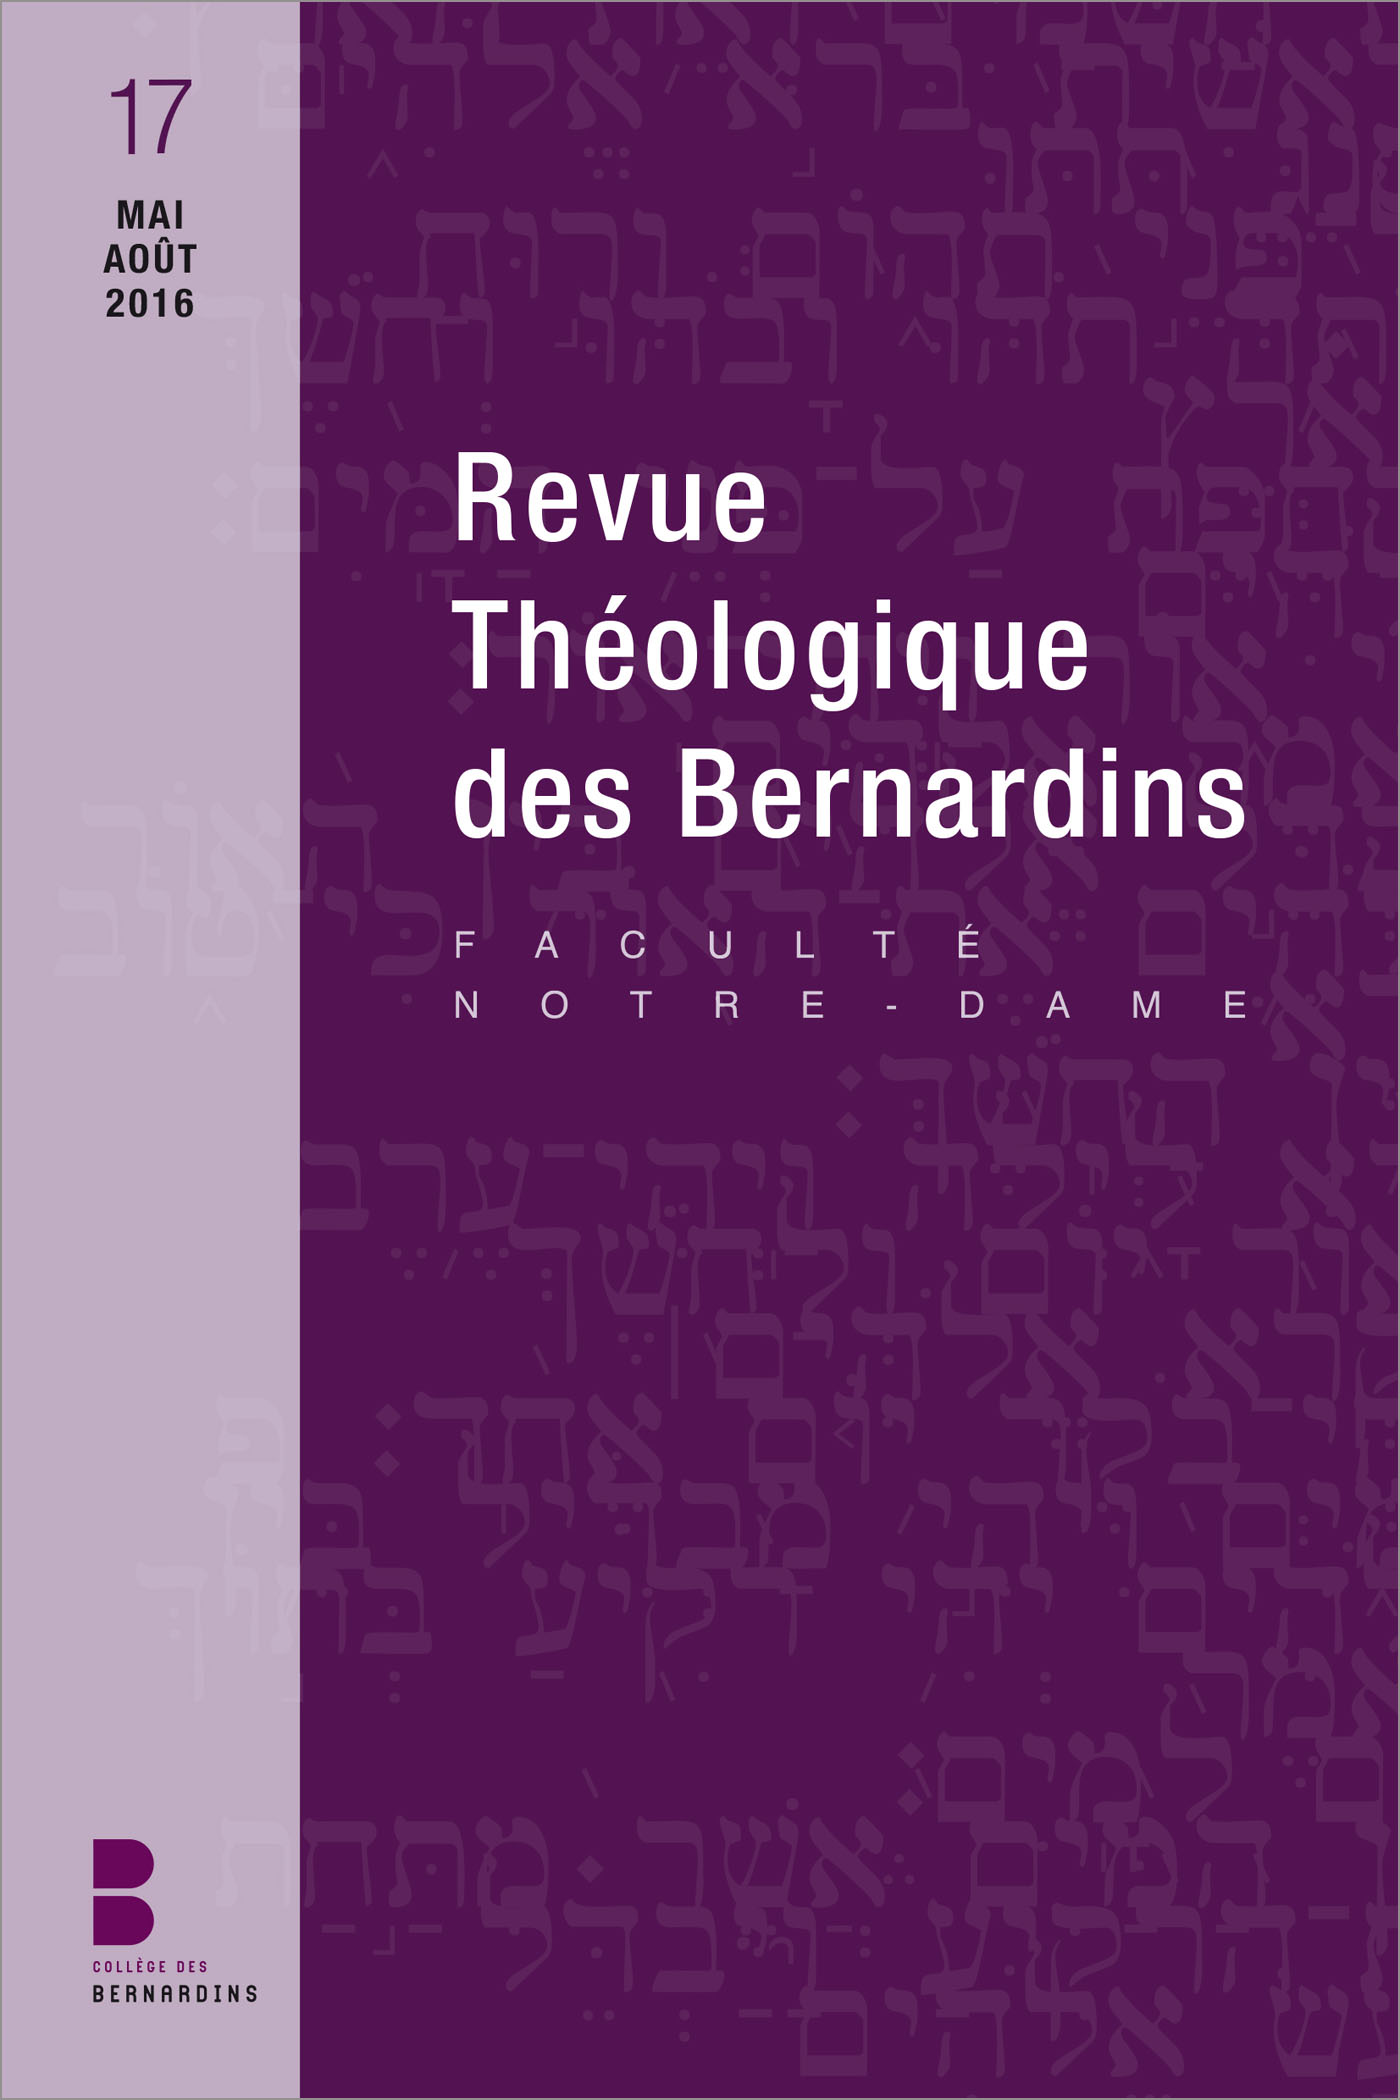 Revue théologique des Bernardins 17